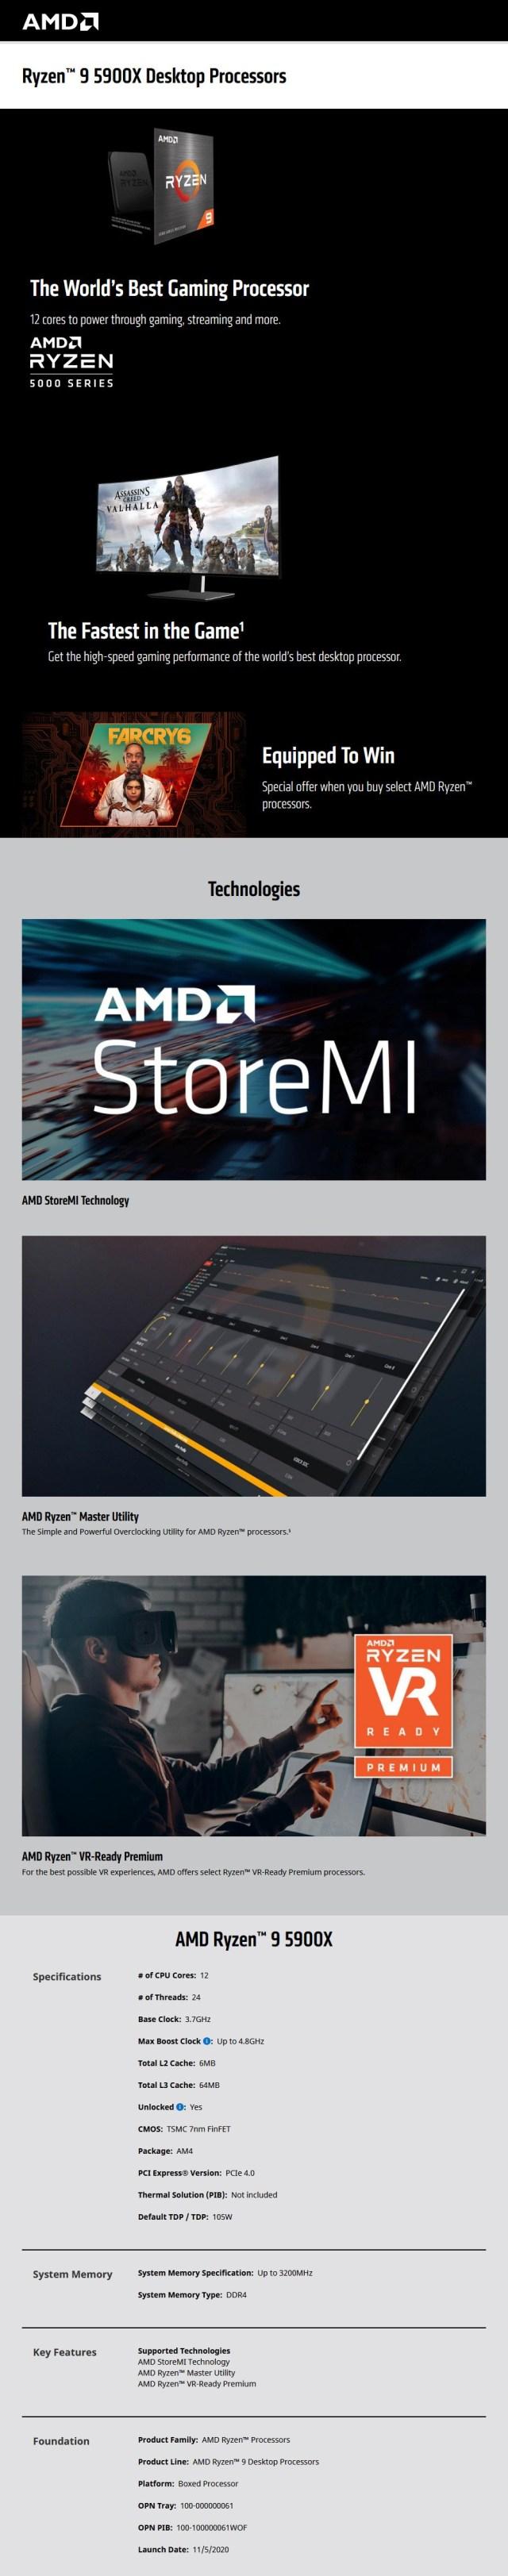 Bundle Deal: AMD Ryzen 9 5900X + Gigabyte X570 AORUS PRO WIFI ATX Motherboard - Desktop Overview 1